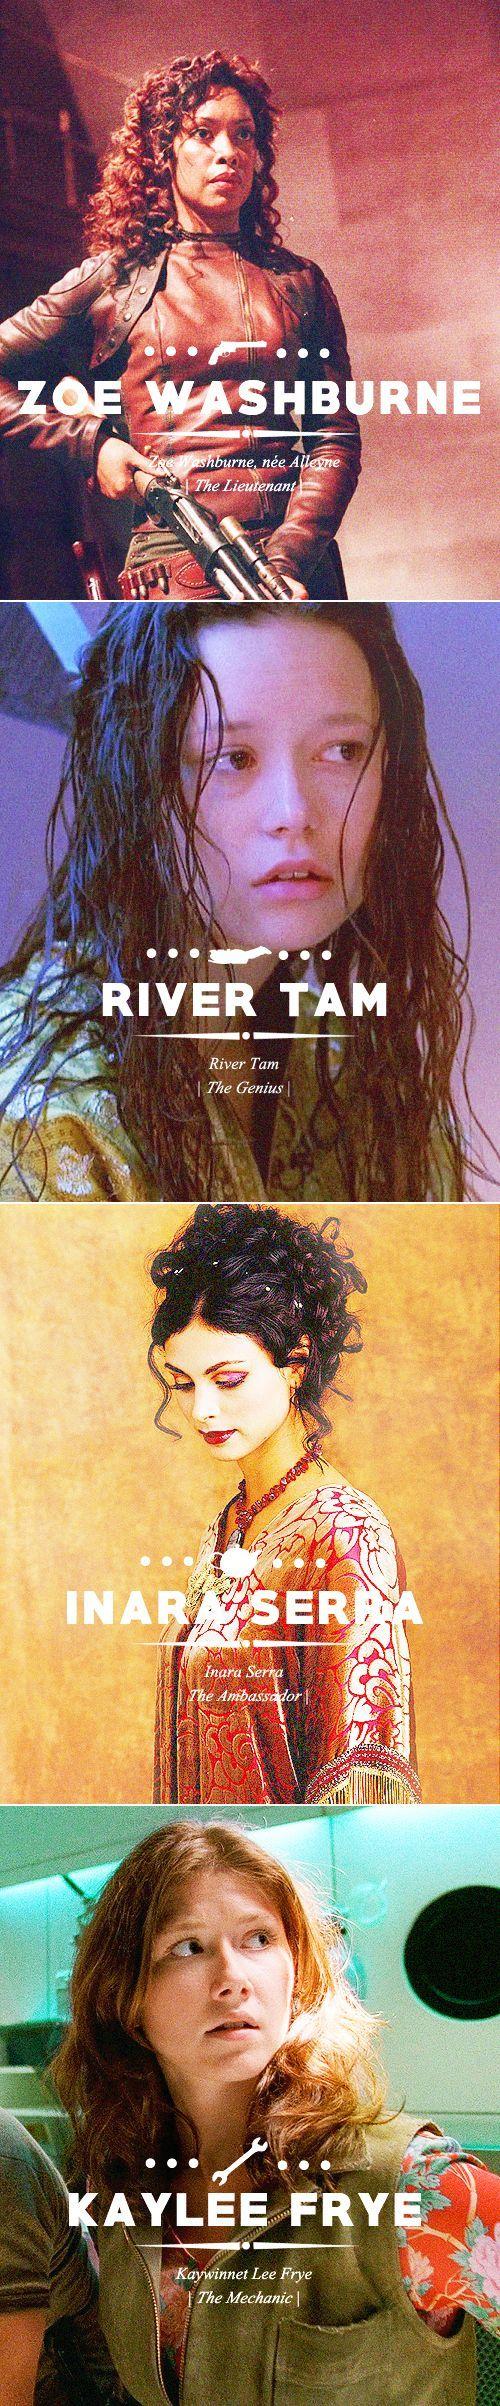 Zoe Washburne | River Tam | Inara Serra | Kaylee Frye #firefly: